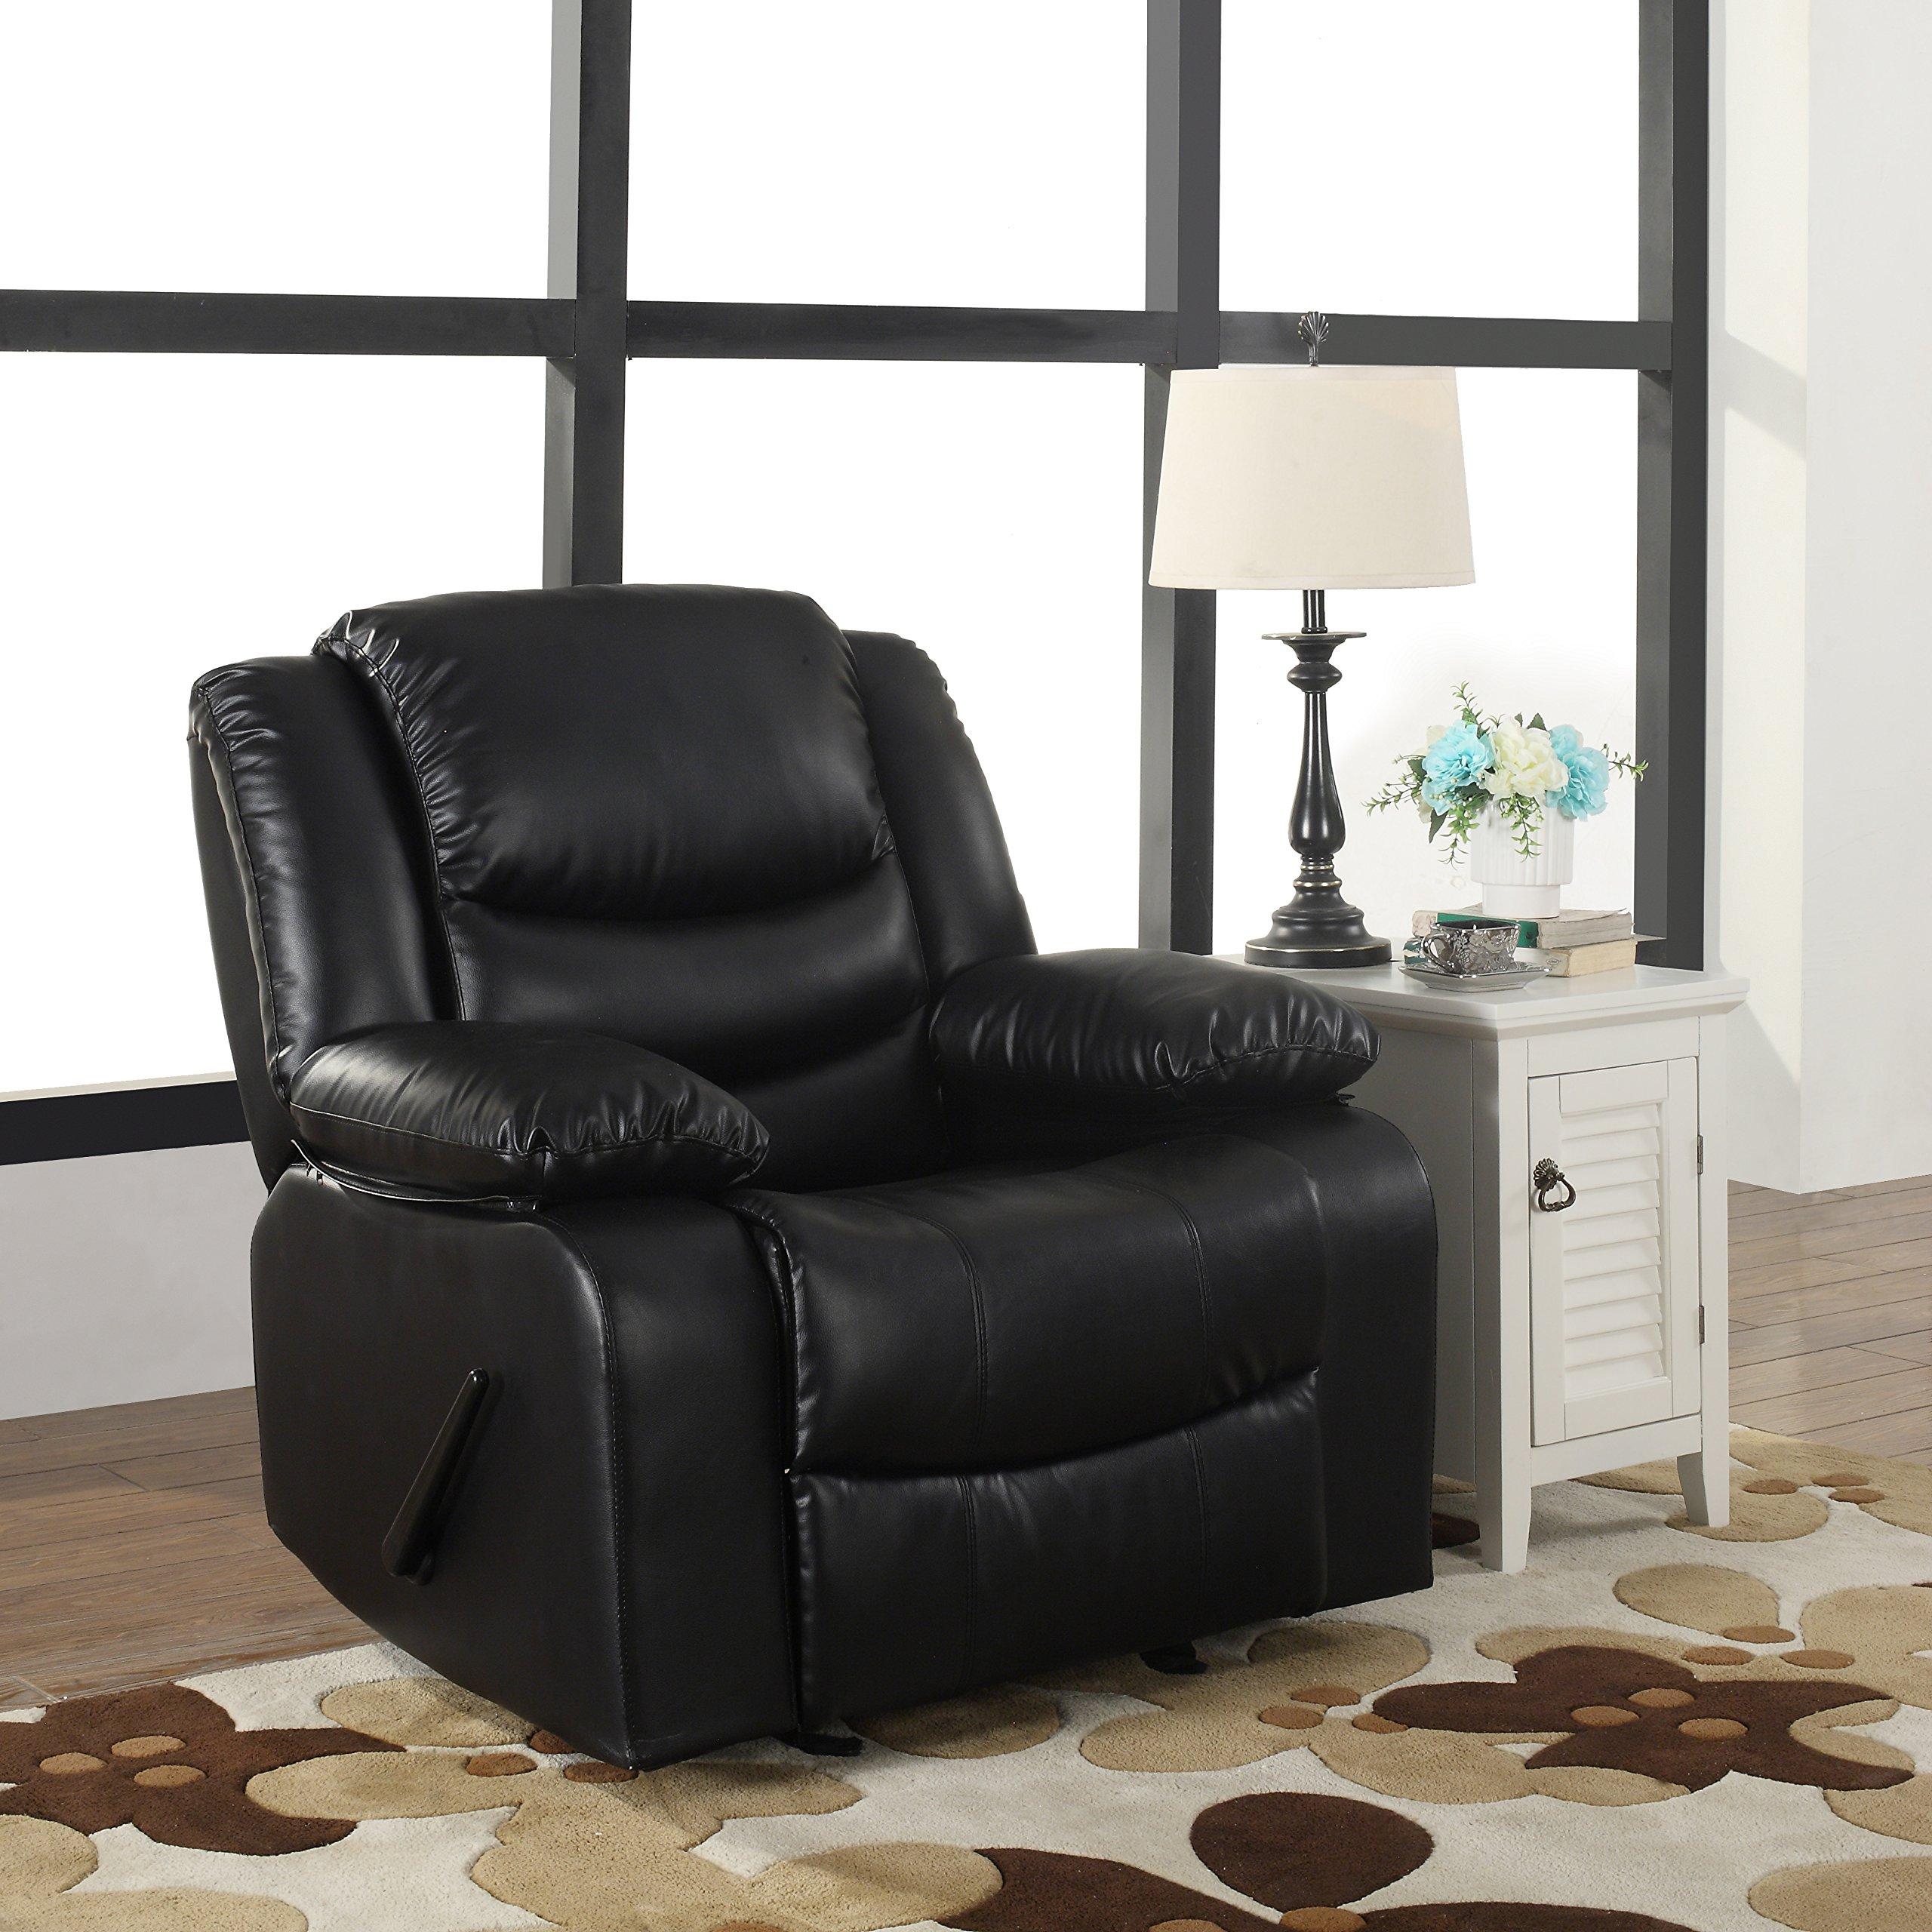 Bonded Leather Rocker Recliner Living Room Chair, Black / Brown (Black)